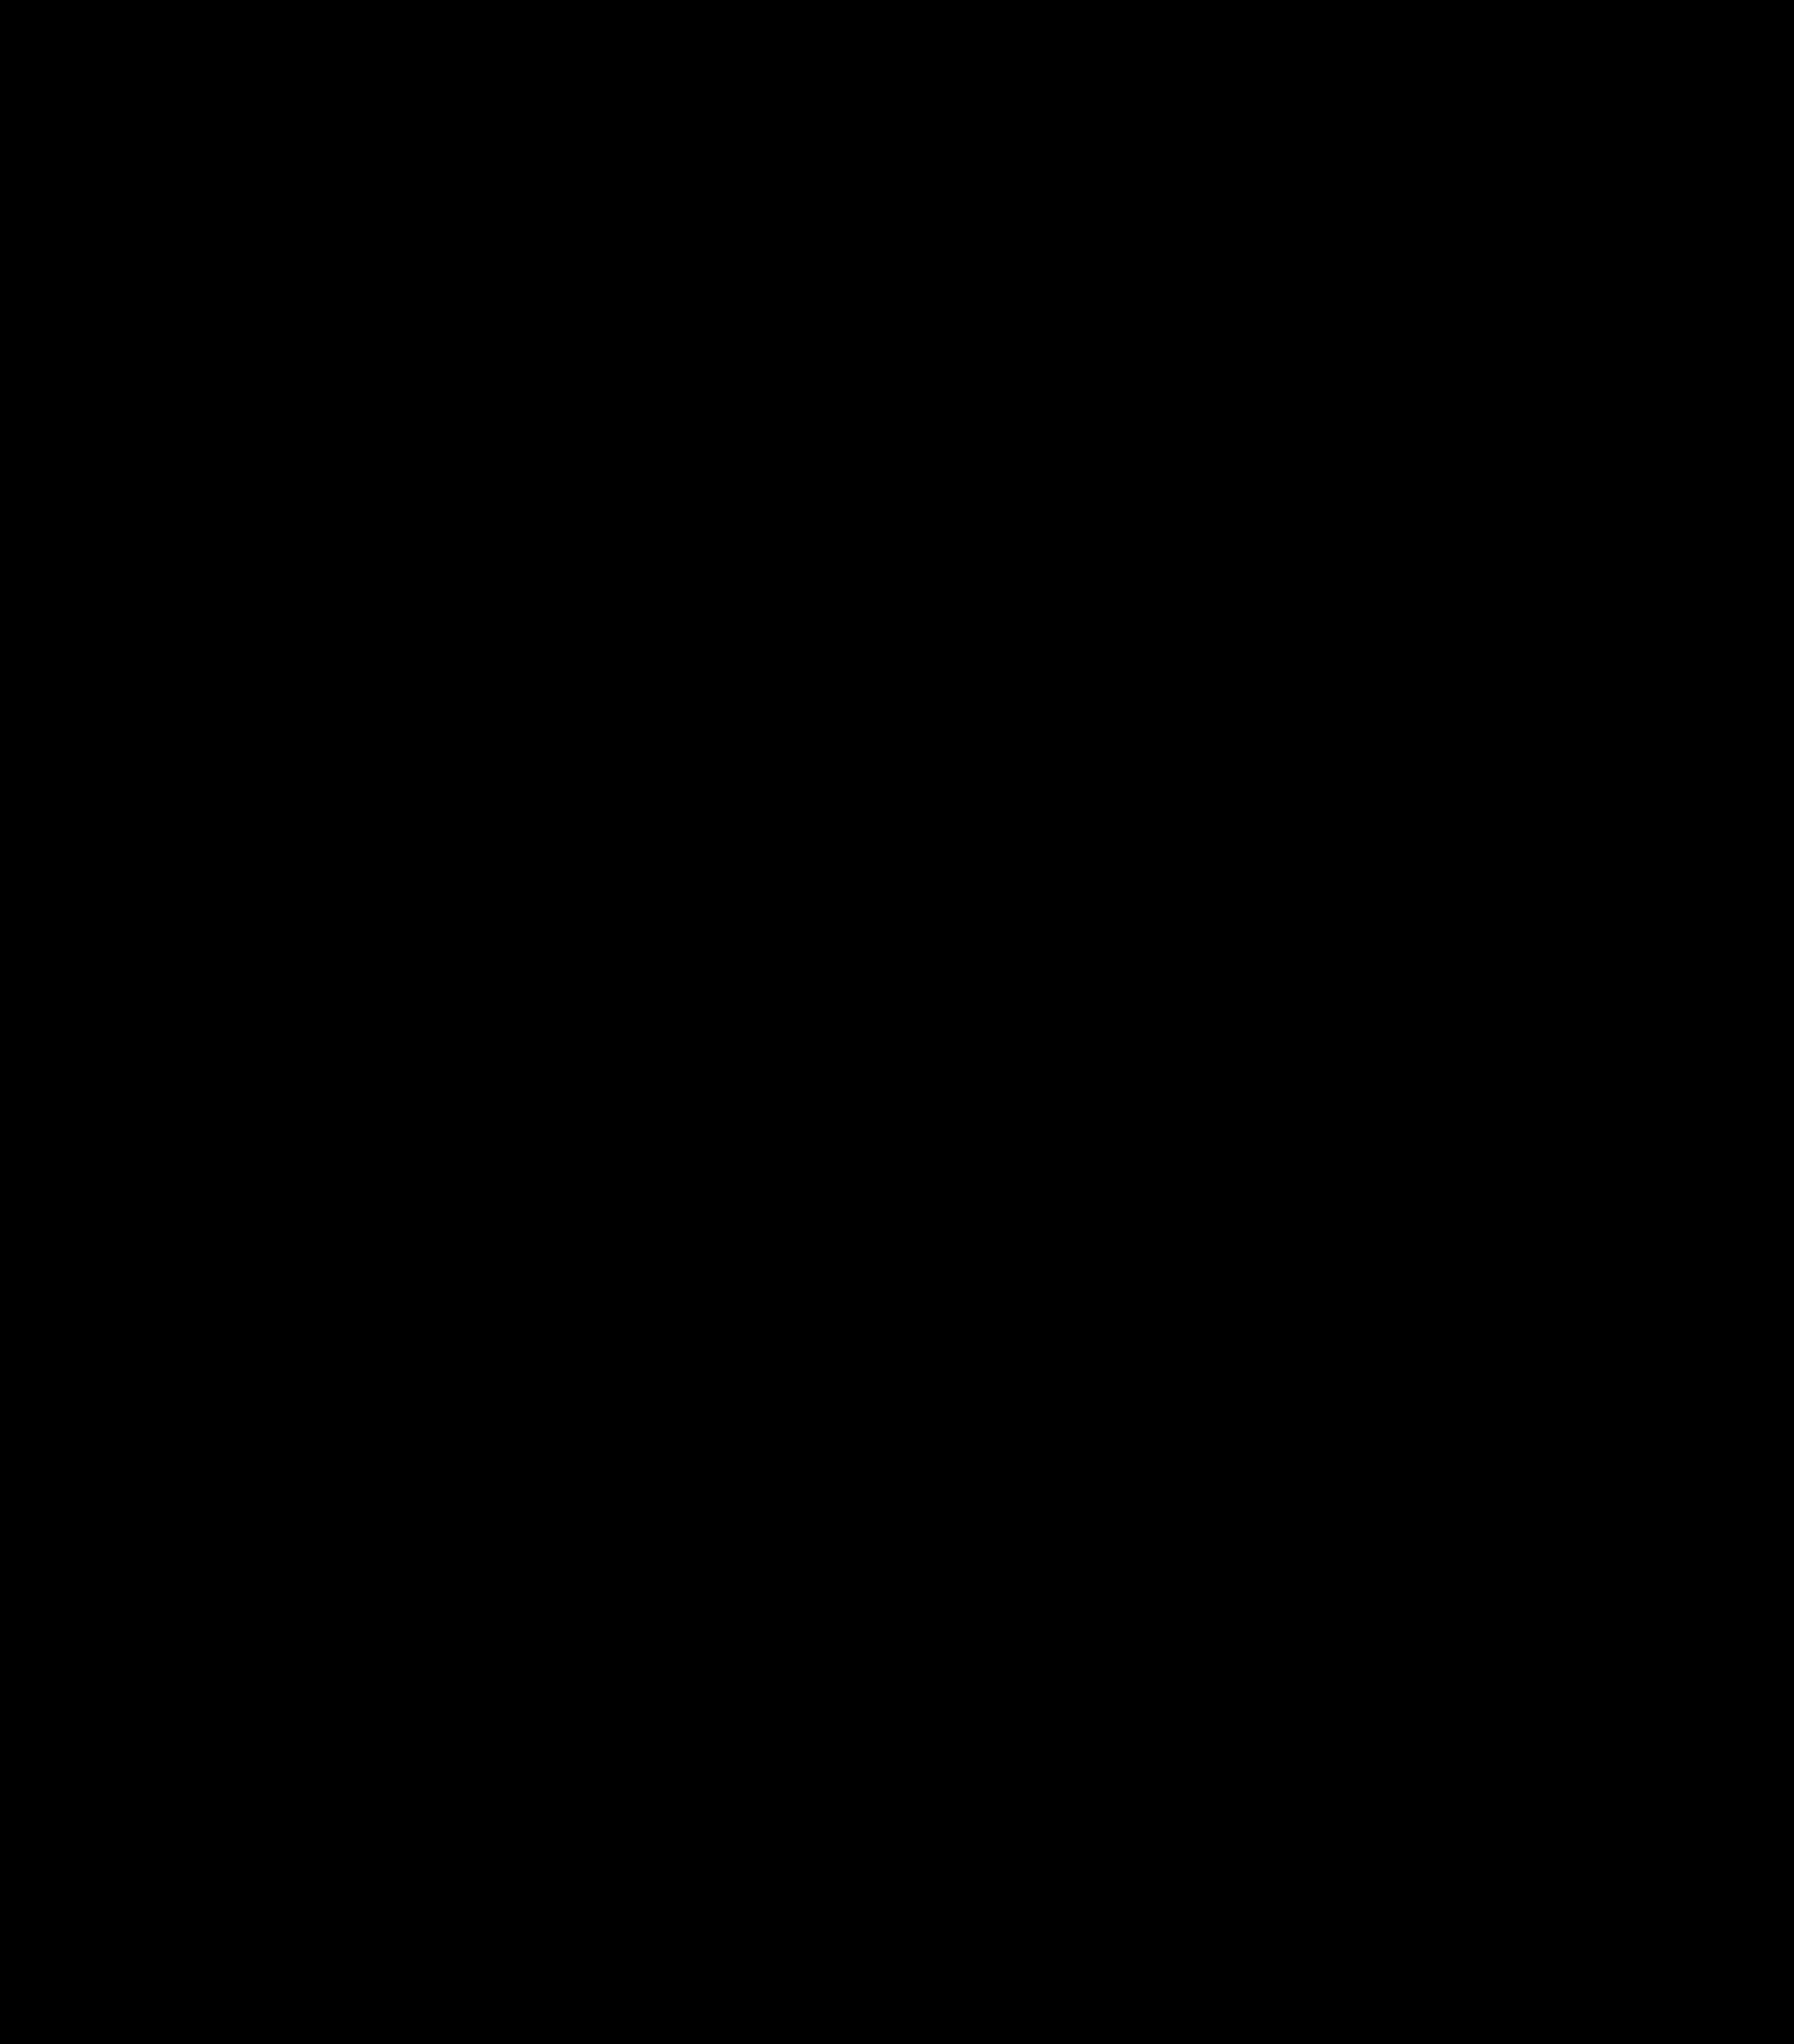 elk clipart wapiti